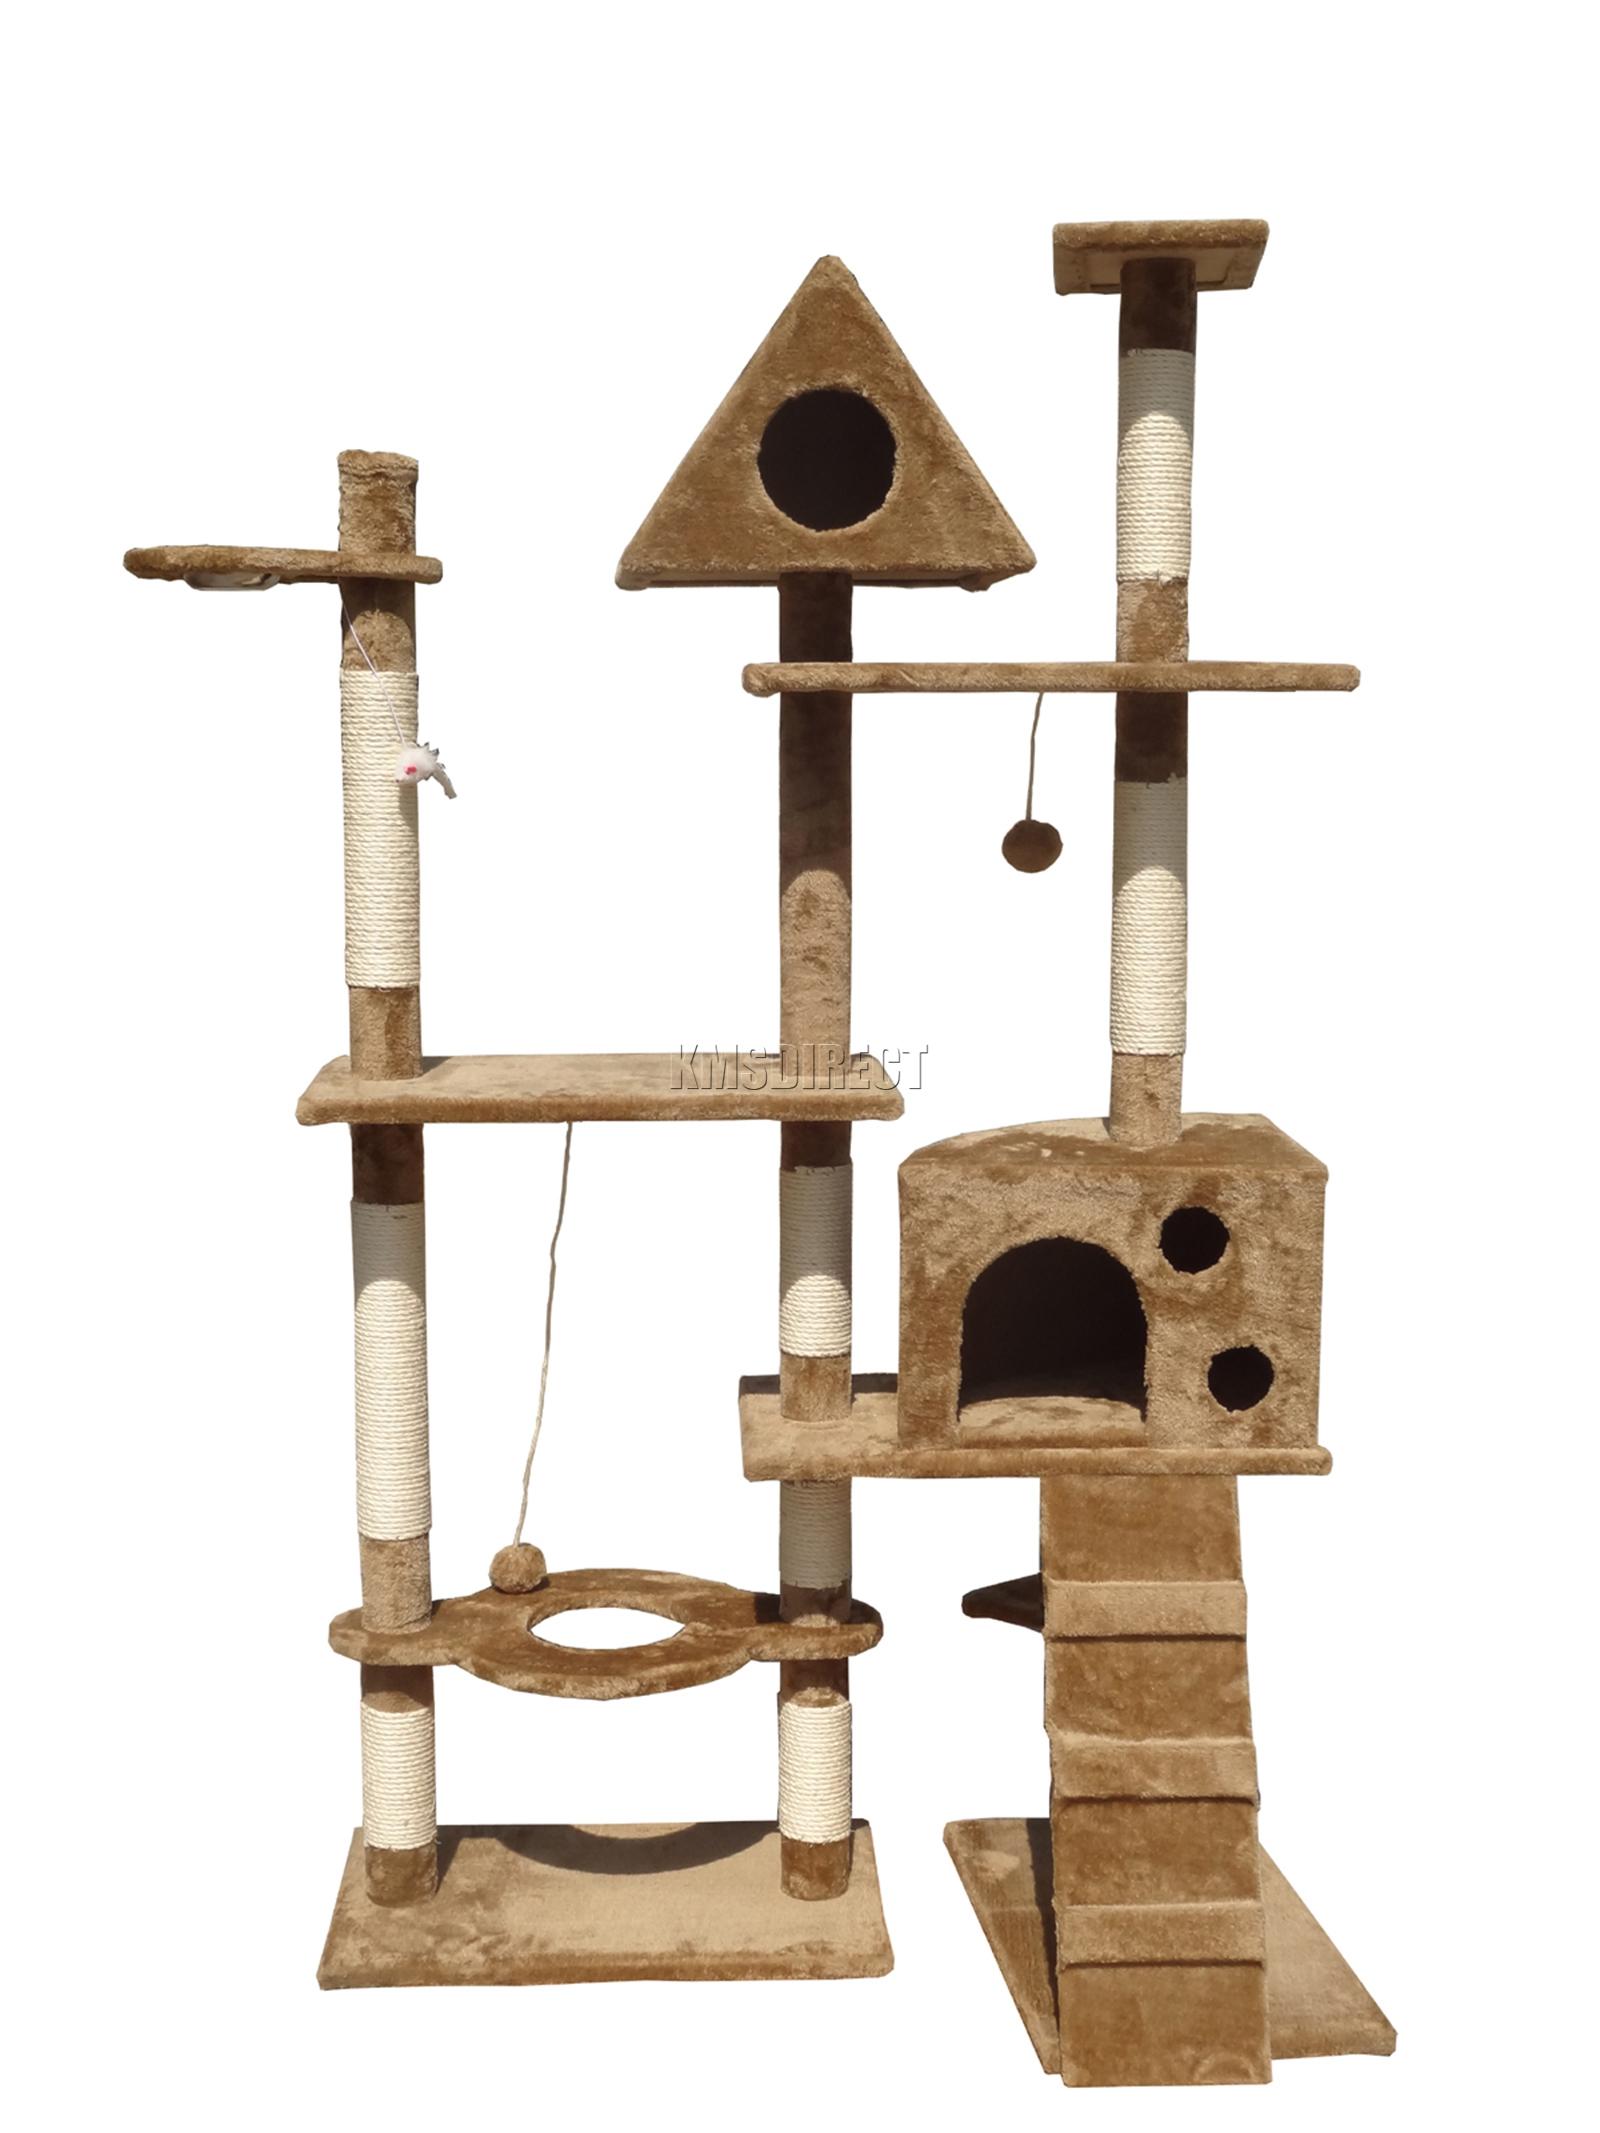 Foxhunter kitten cat tree scratching post activity centre bed toy scratcher 2200 ebay - Cat bed scratcher ...